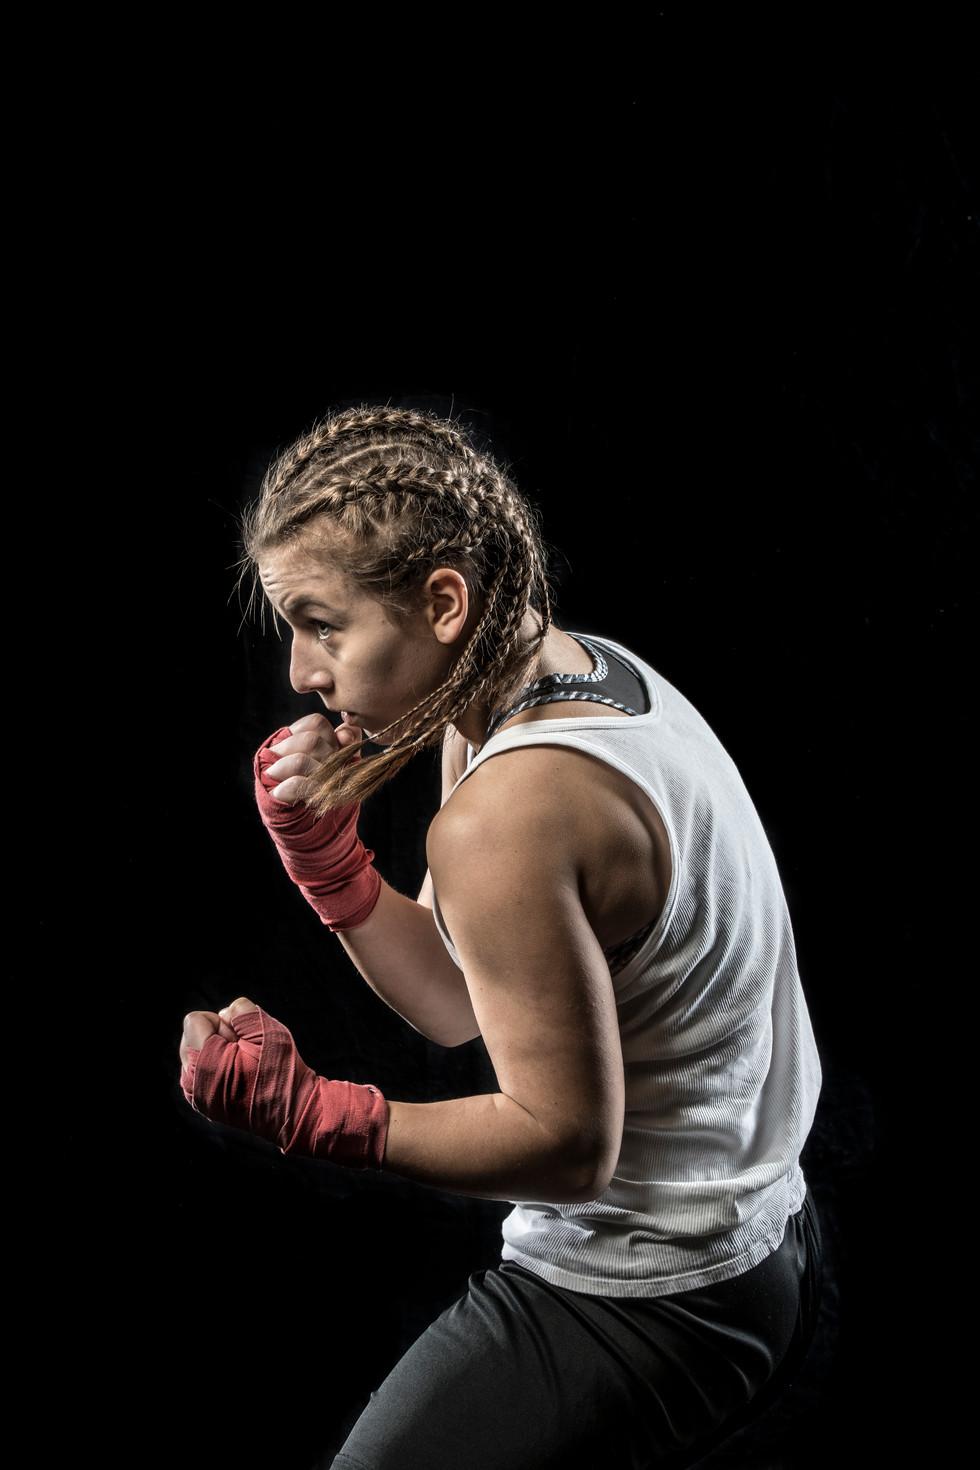 Sportfotografie-Boxen-Boxerin-11.jpg